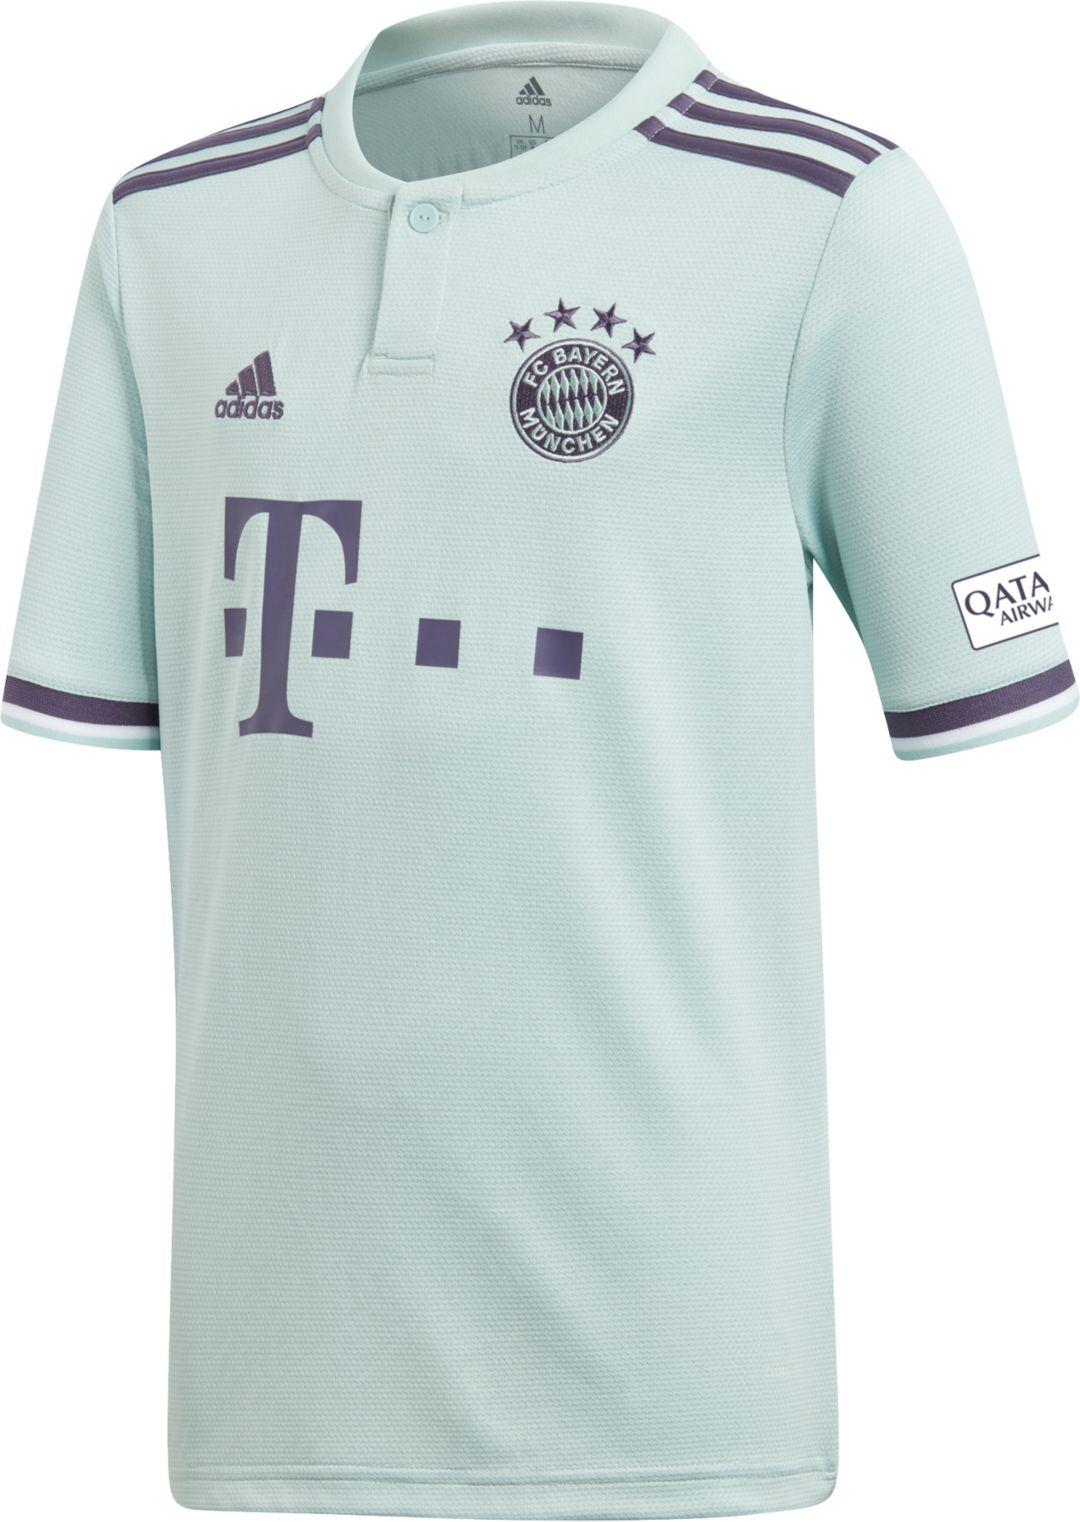 89de53f4 adidas Youth Bayern Munich 2018 Stadium Away Replica Jersey. noImageFound. 1